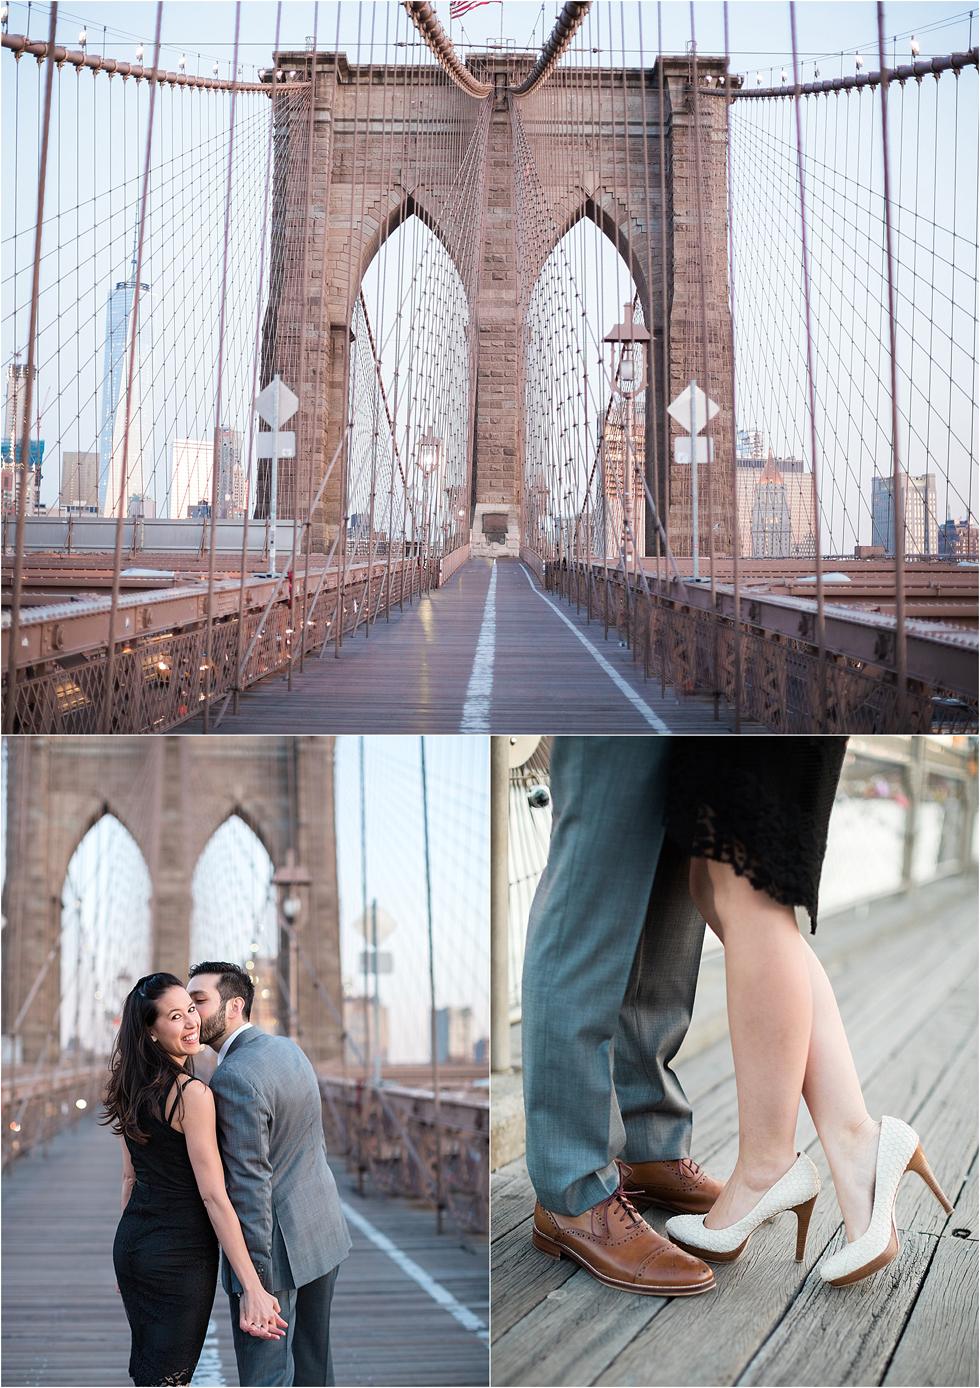 new_york_brooklyn_bridge_engagement_session_boston_wedding_photographer_photo0011